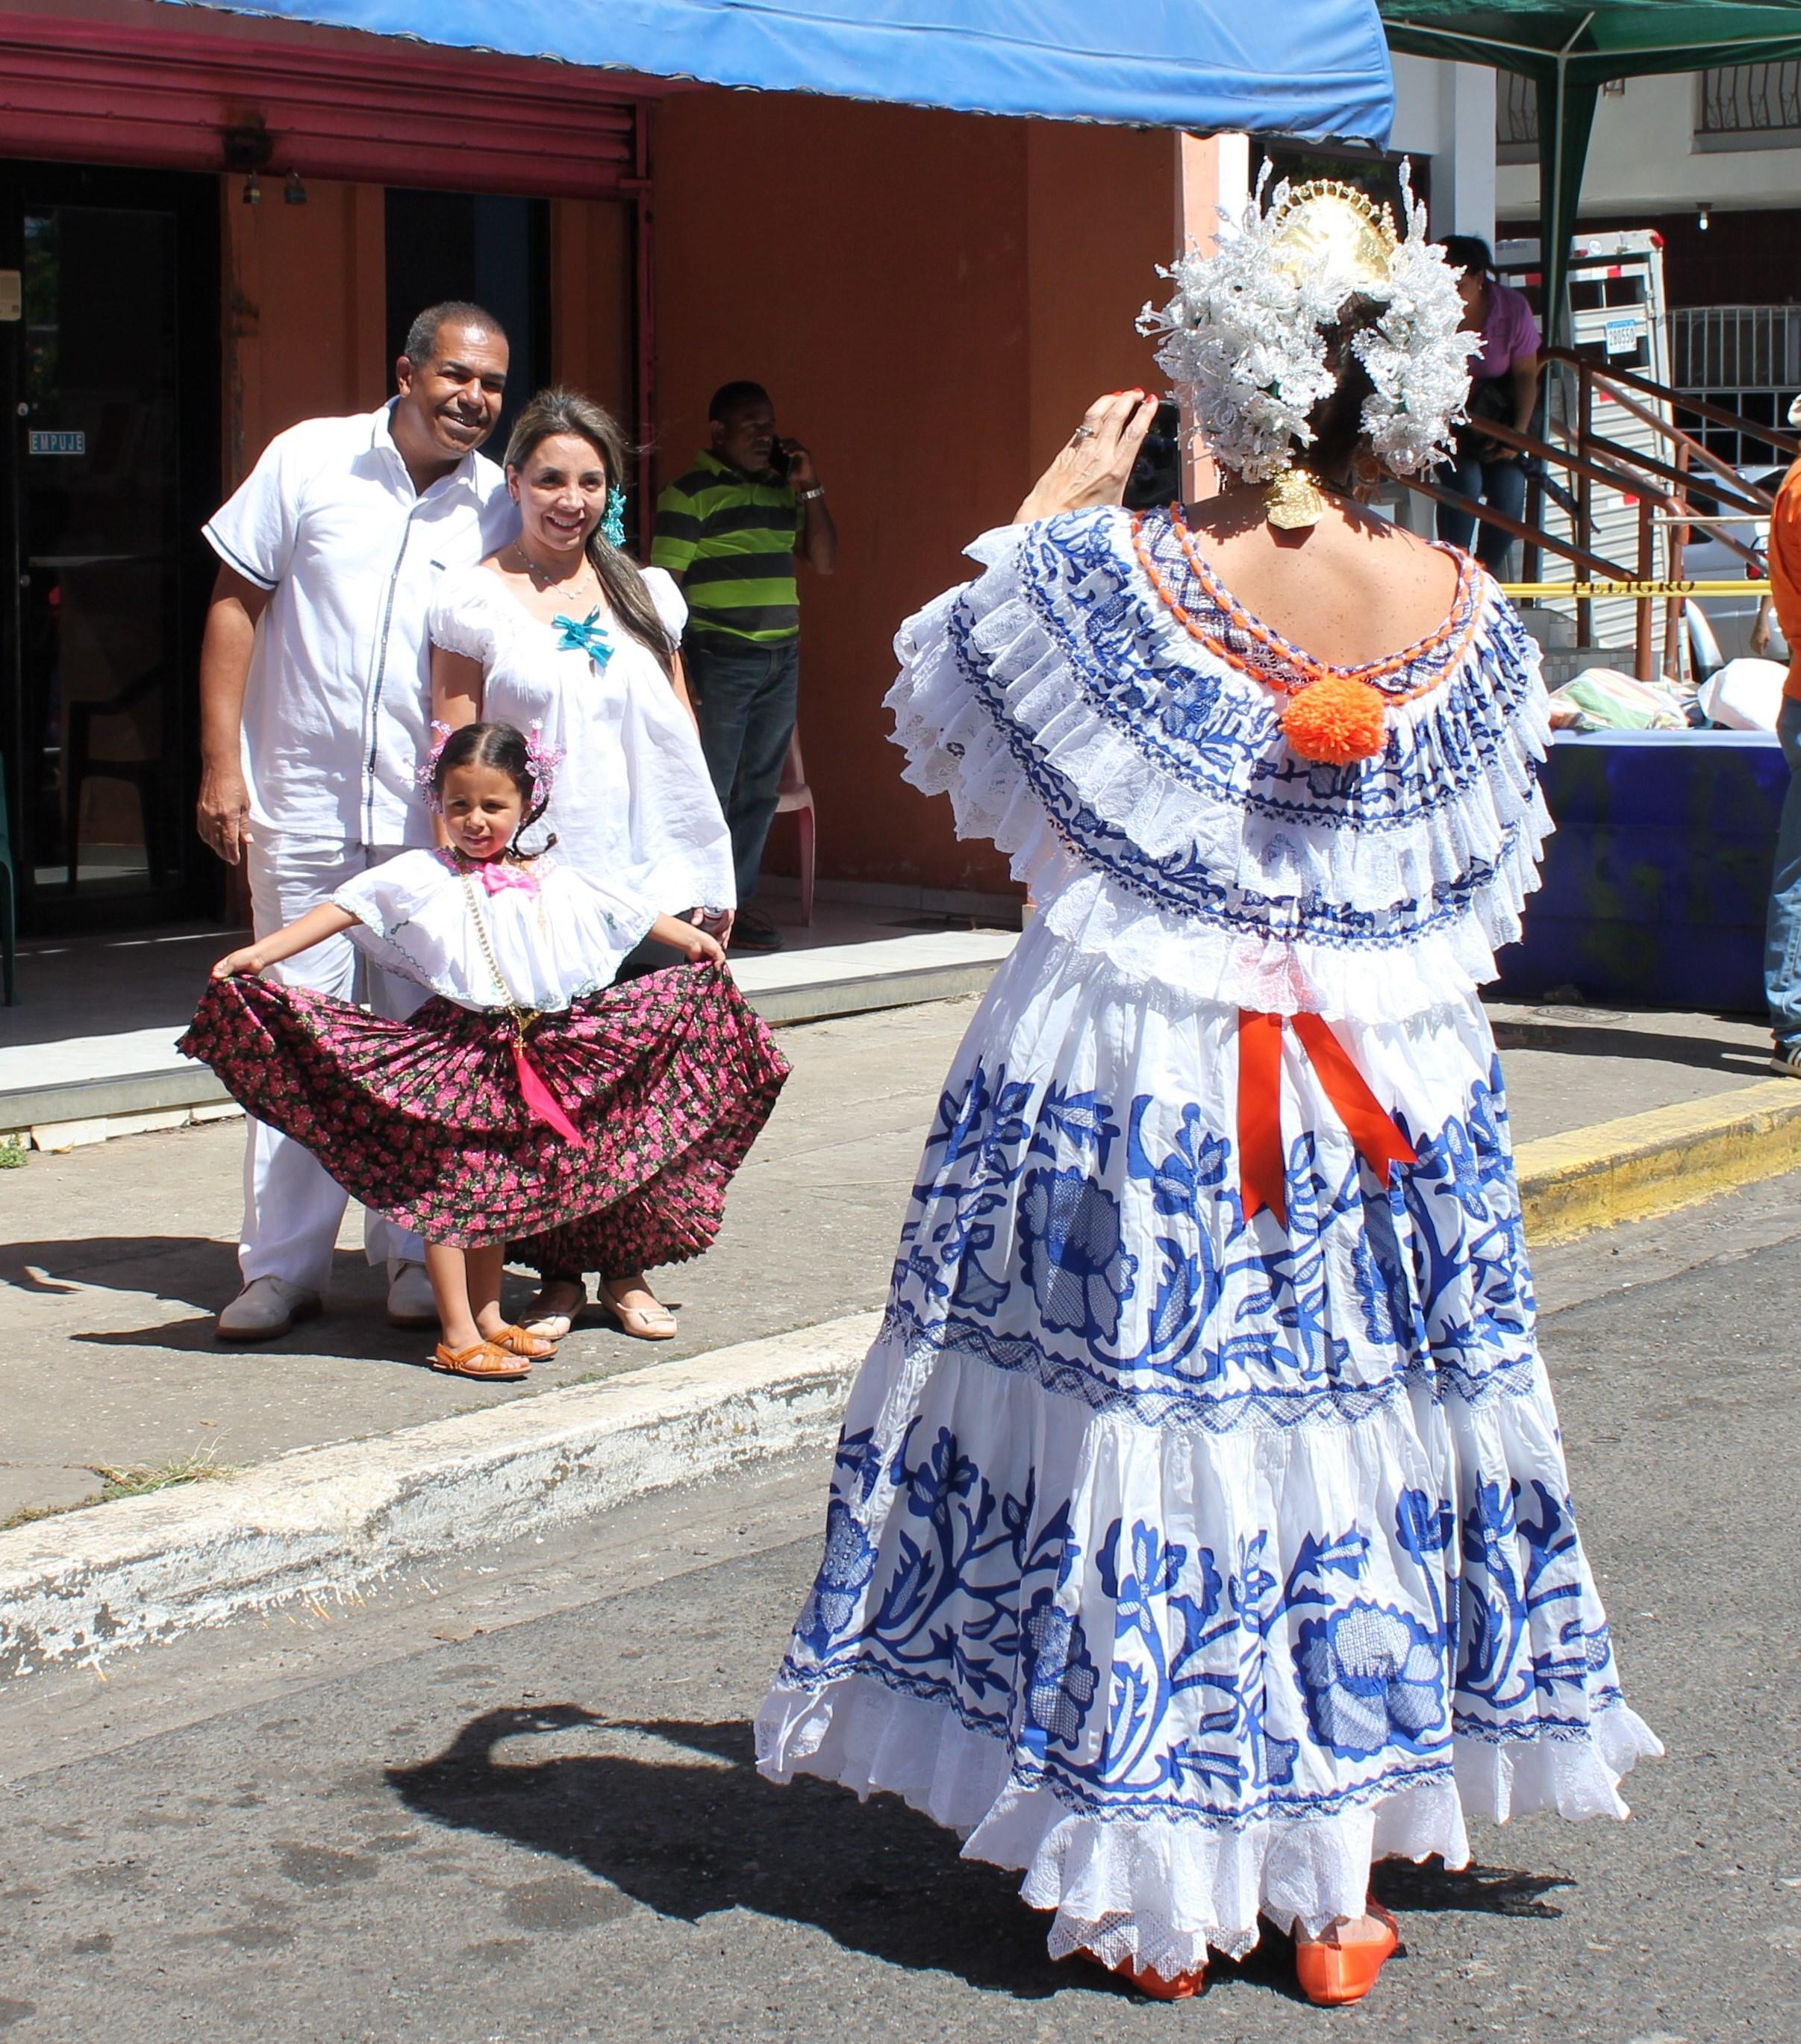 photo-op-2-pollera-parade A Panama Road Trip Panama Panama Fairs and Festivals